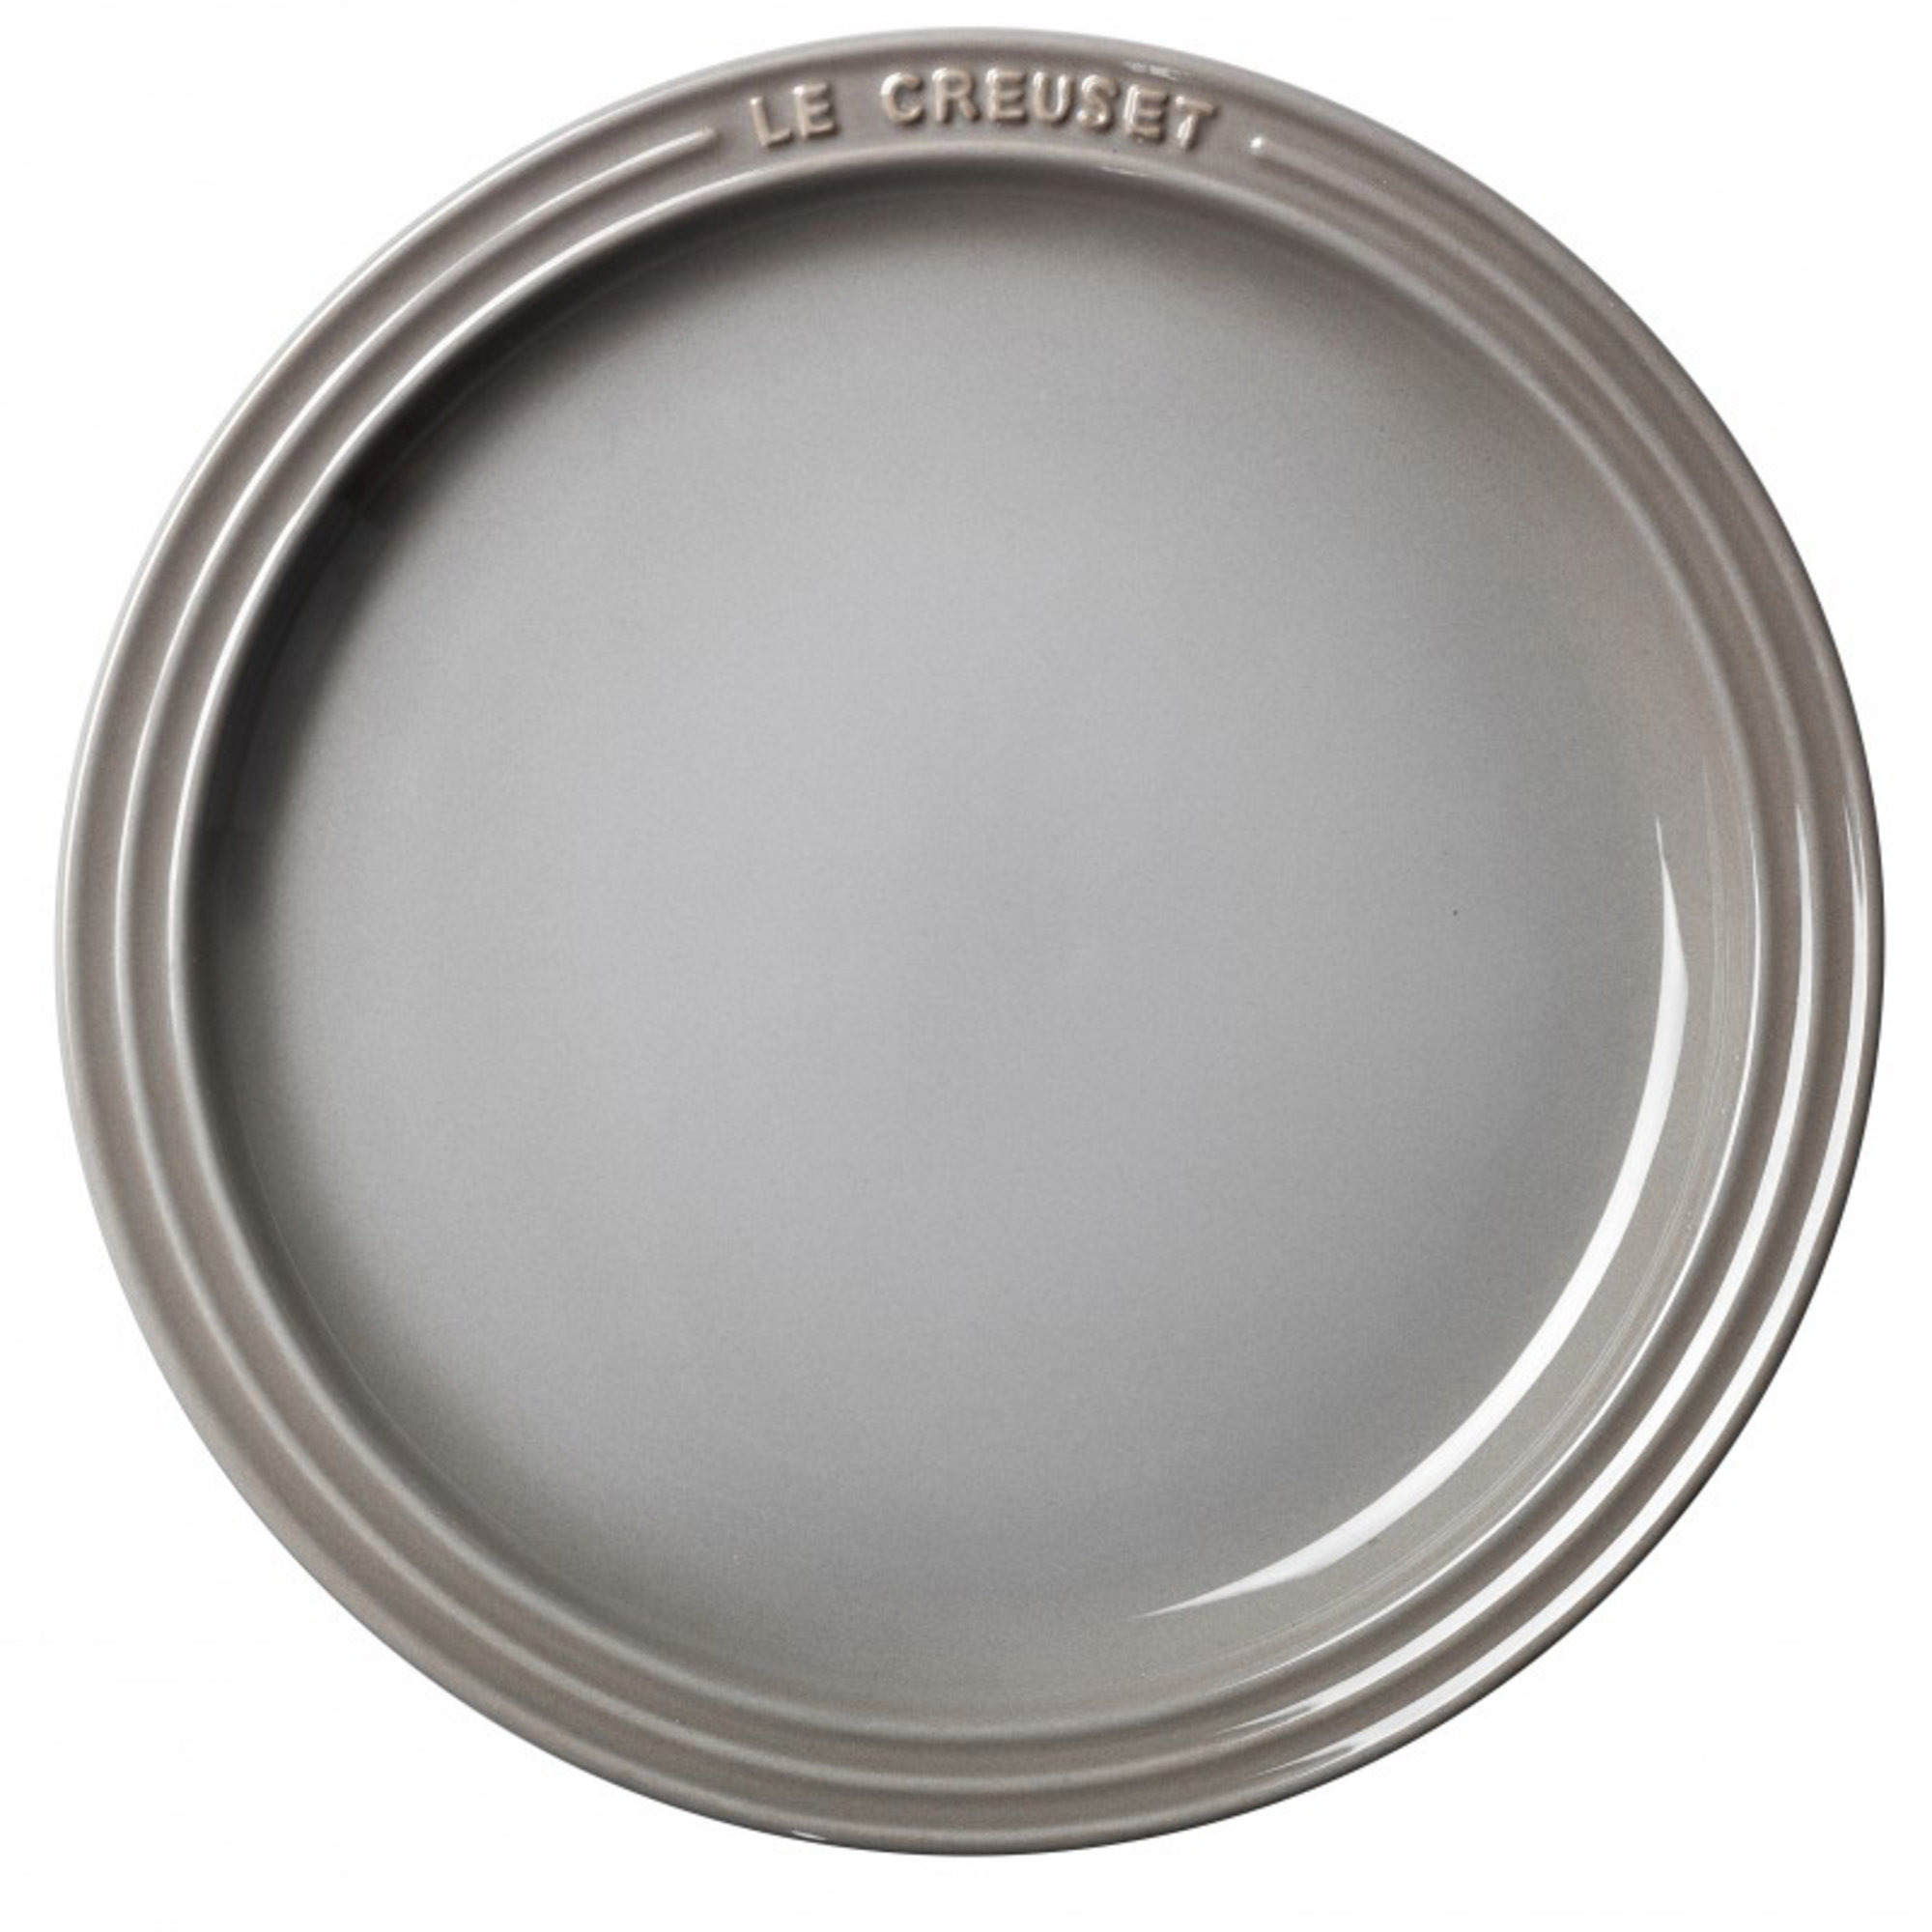 Le Creuset Tallrik 18 cm Mist Gray